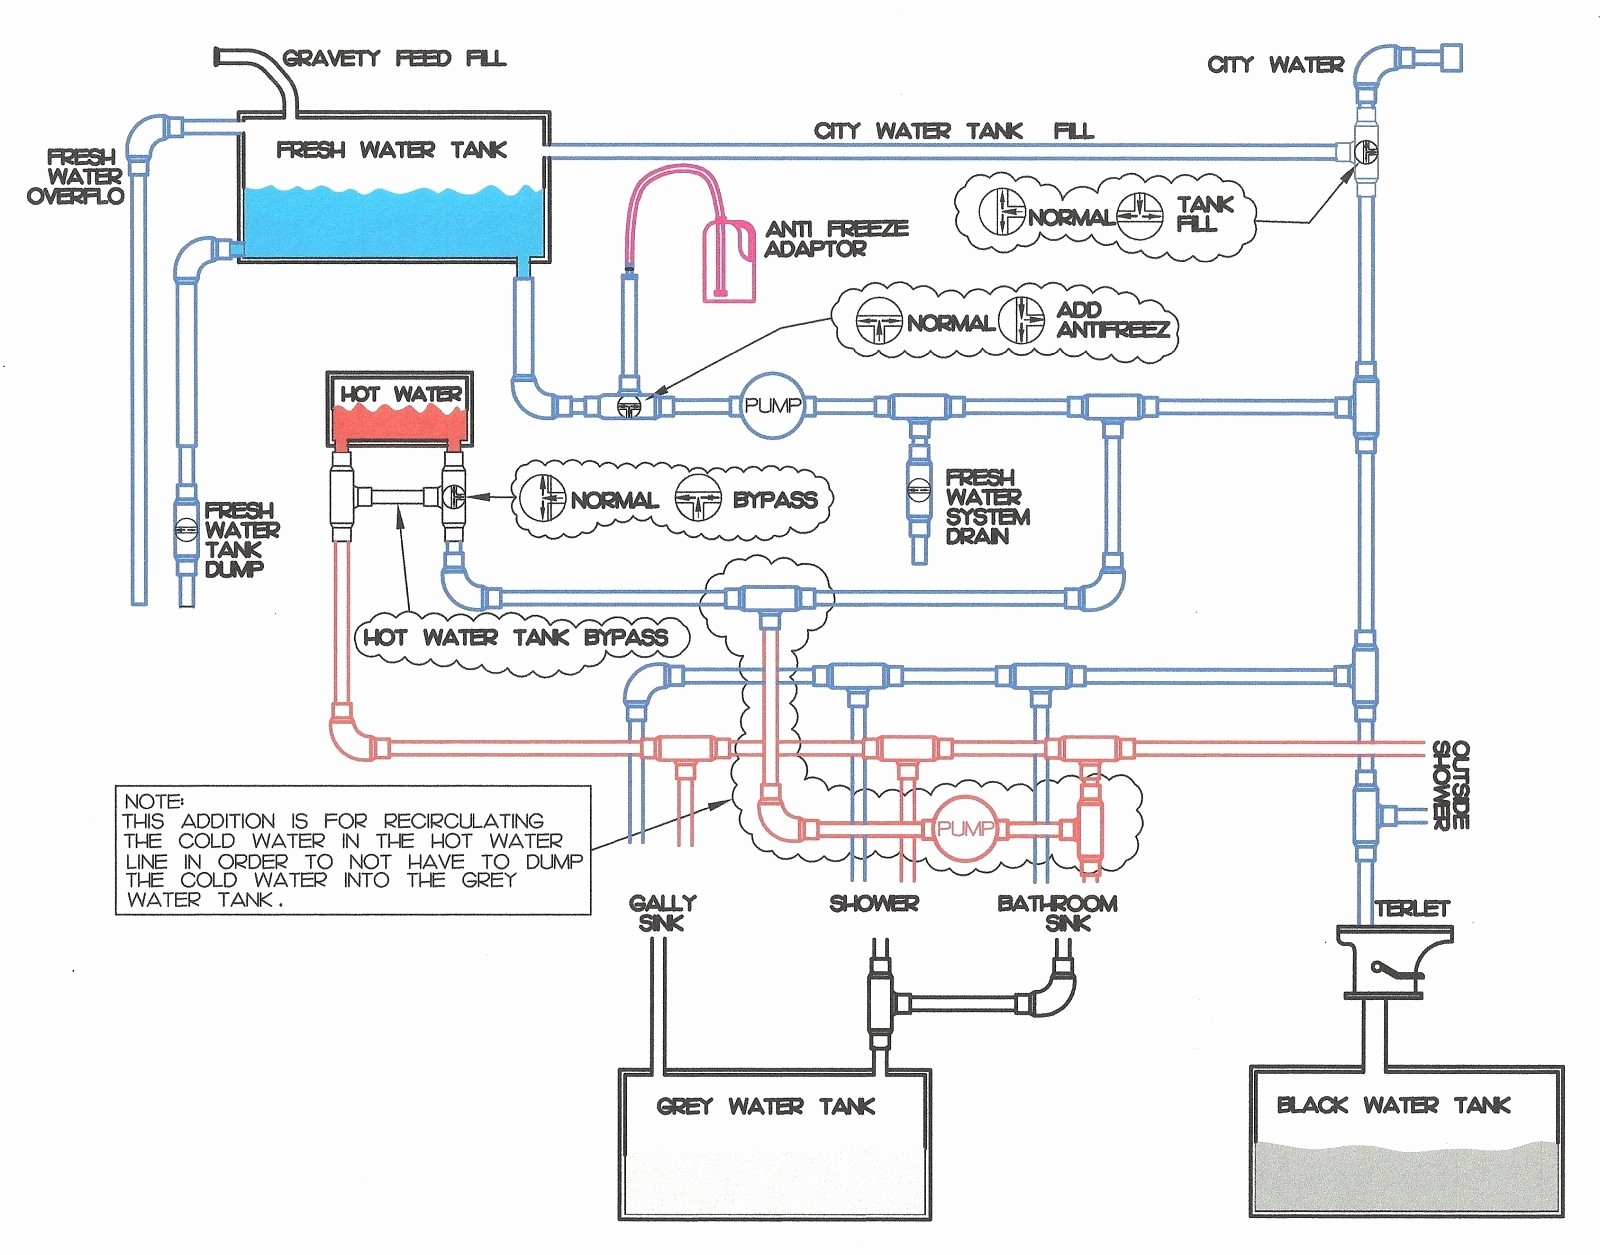 keystone rv cable tv wiring diagram RV Isolator Wiring-Diagram keystone rv wiring diagram elegant wiring diagram image rh mainetreasurechest com keystone rv cable tv wiring